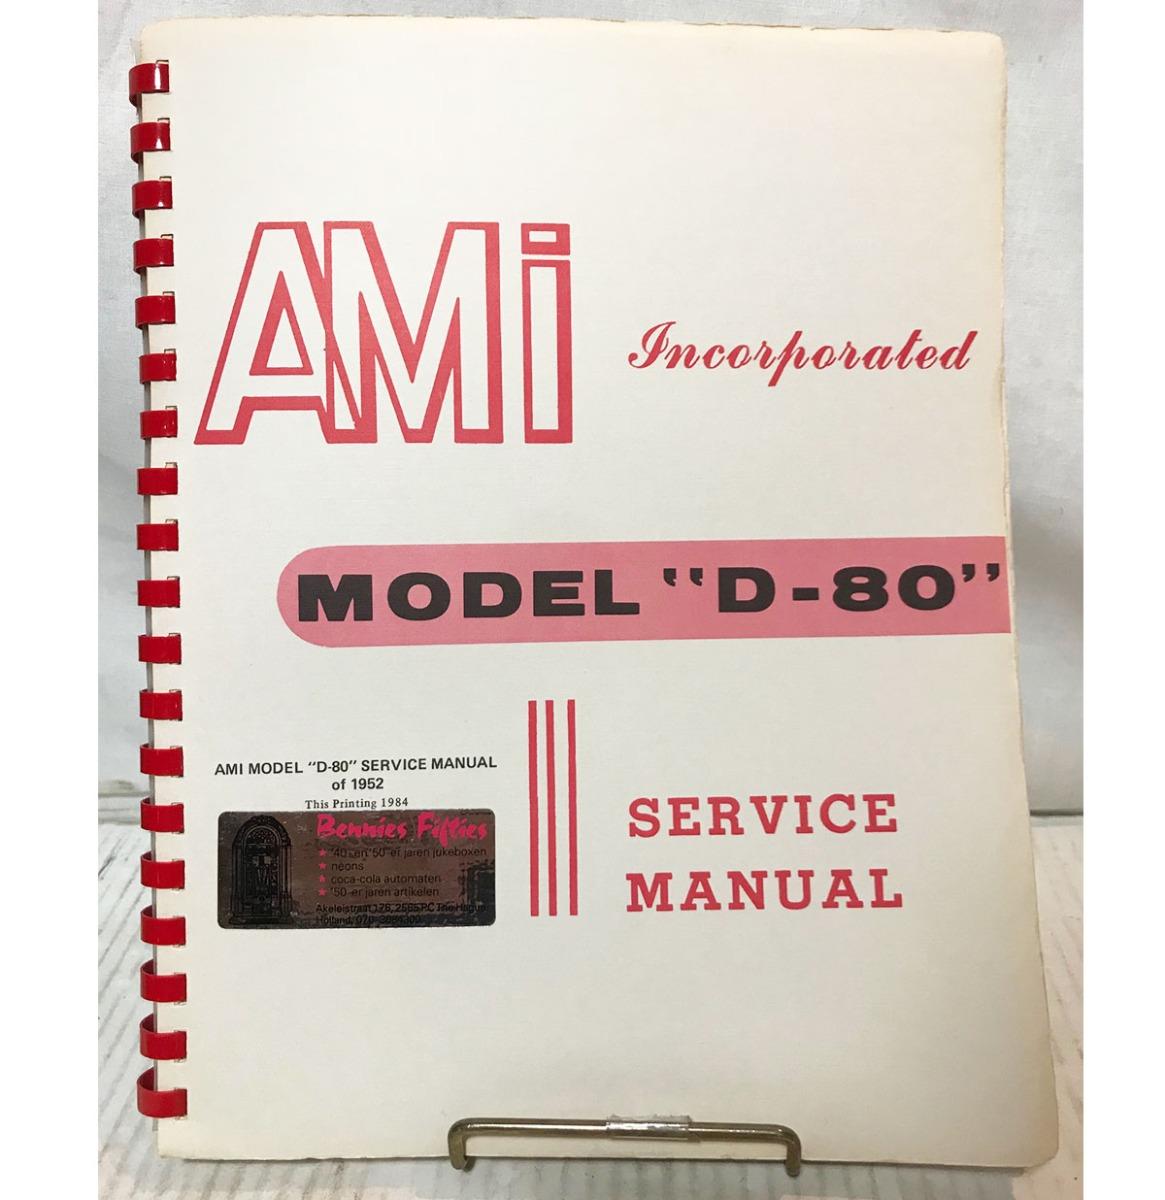 Service Manual - Ami Jukebox Model D-80